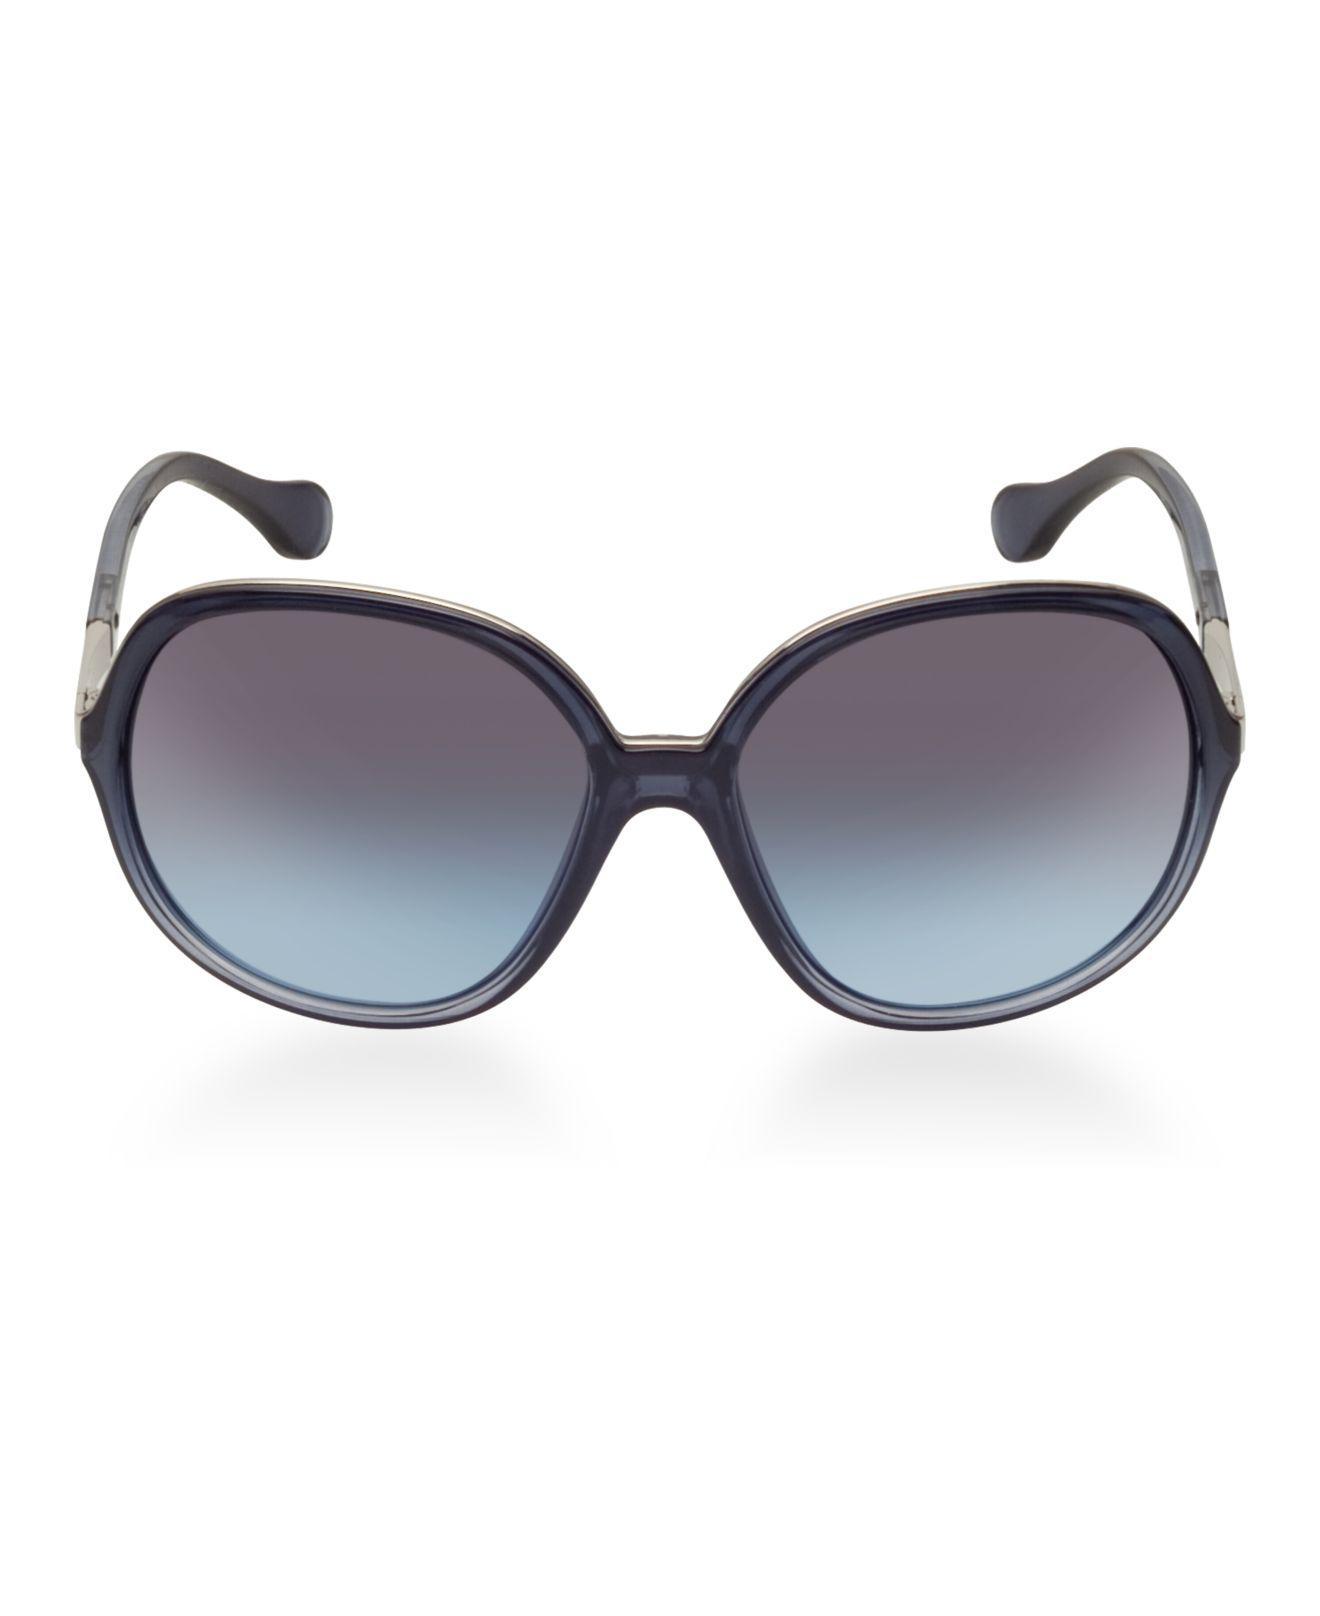 83d3ea63fd Lyst - Dolce   Gabbana Sunglasses